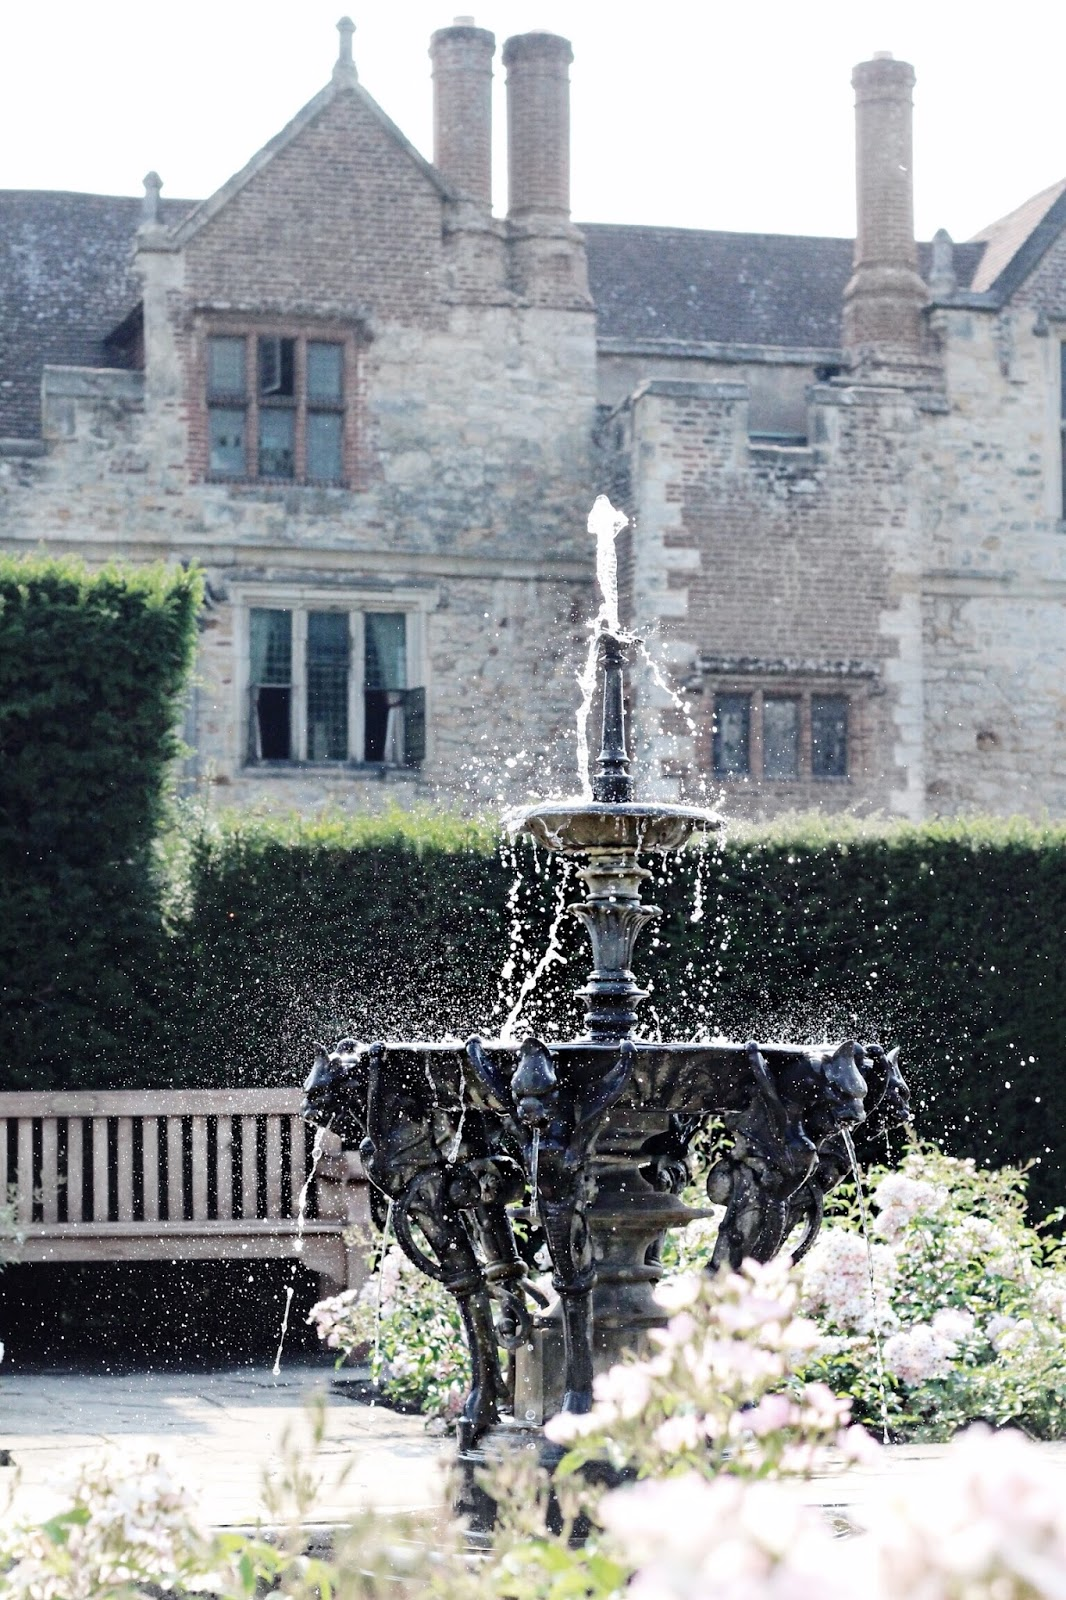 Hever Castle fountains under the sun